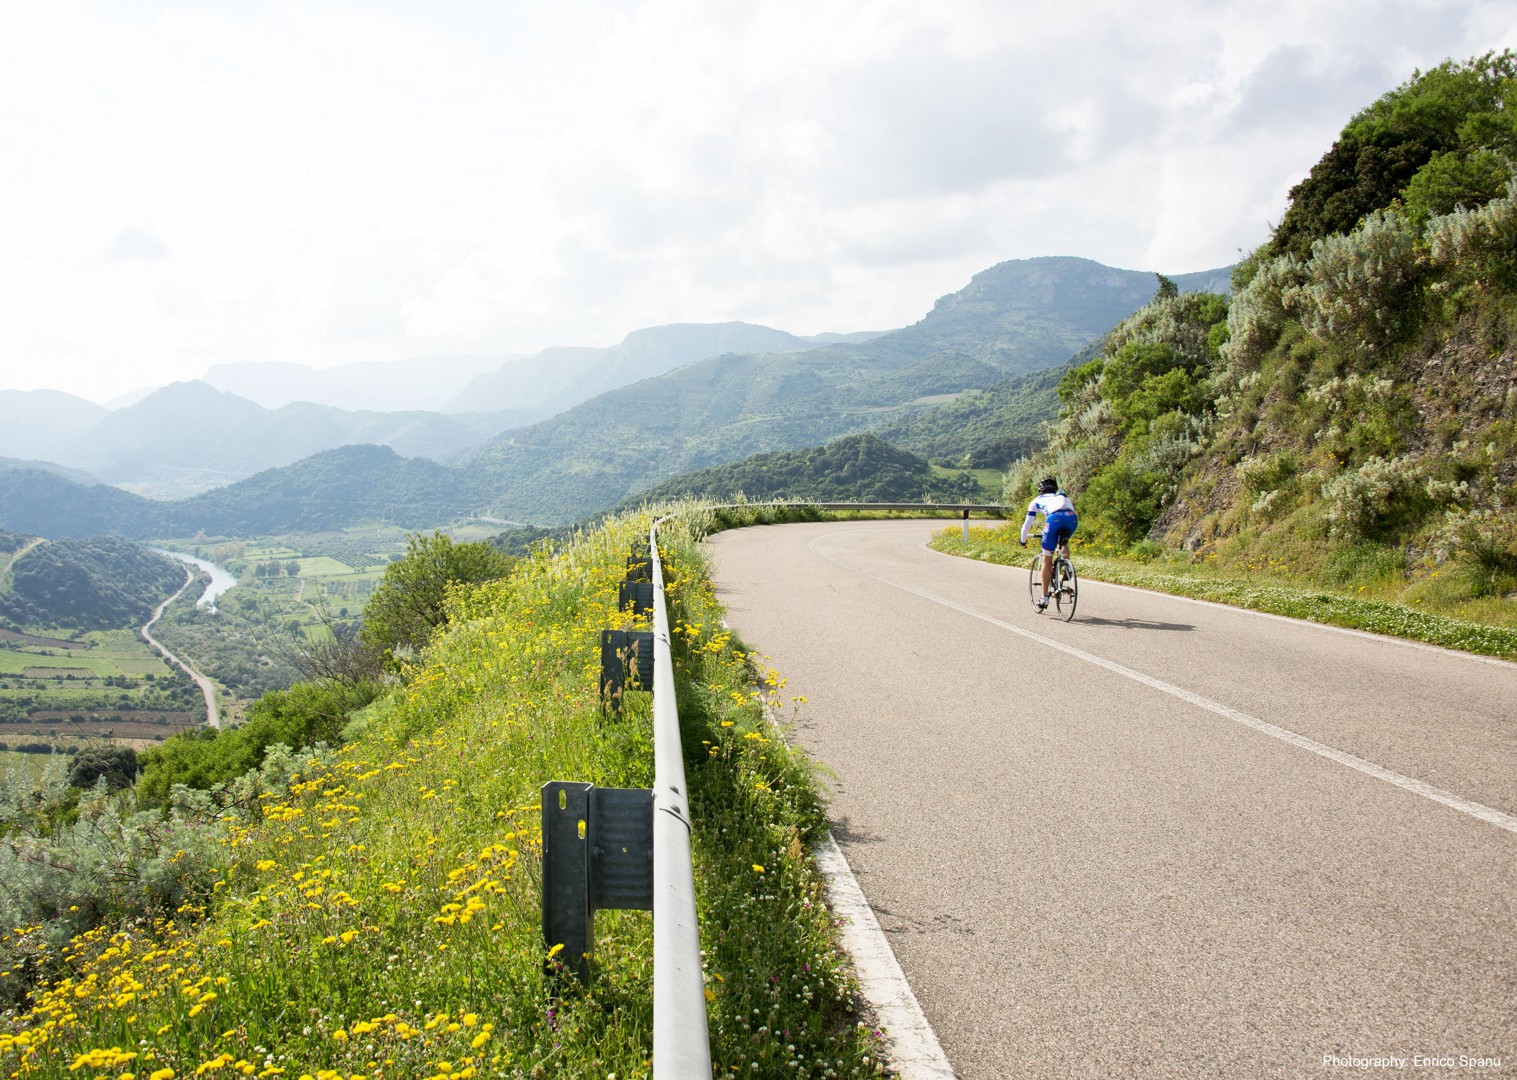 Sardinia-Sardinian-Mountains-Guided-Road-Cycling-Holiday-Mediterranean-gem.jpg - Italy - Sardinia - Sardinian Mountains - Guided Road Cycling Holiday - Italia Road Cycling